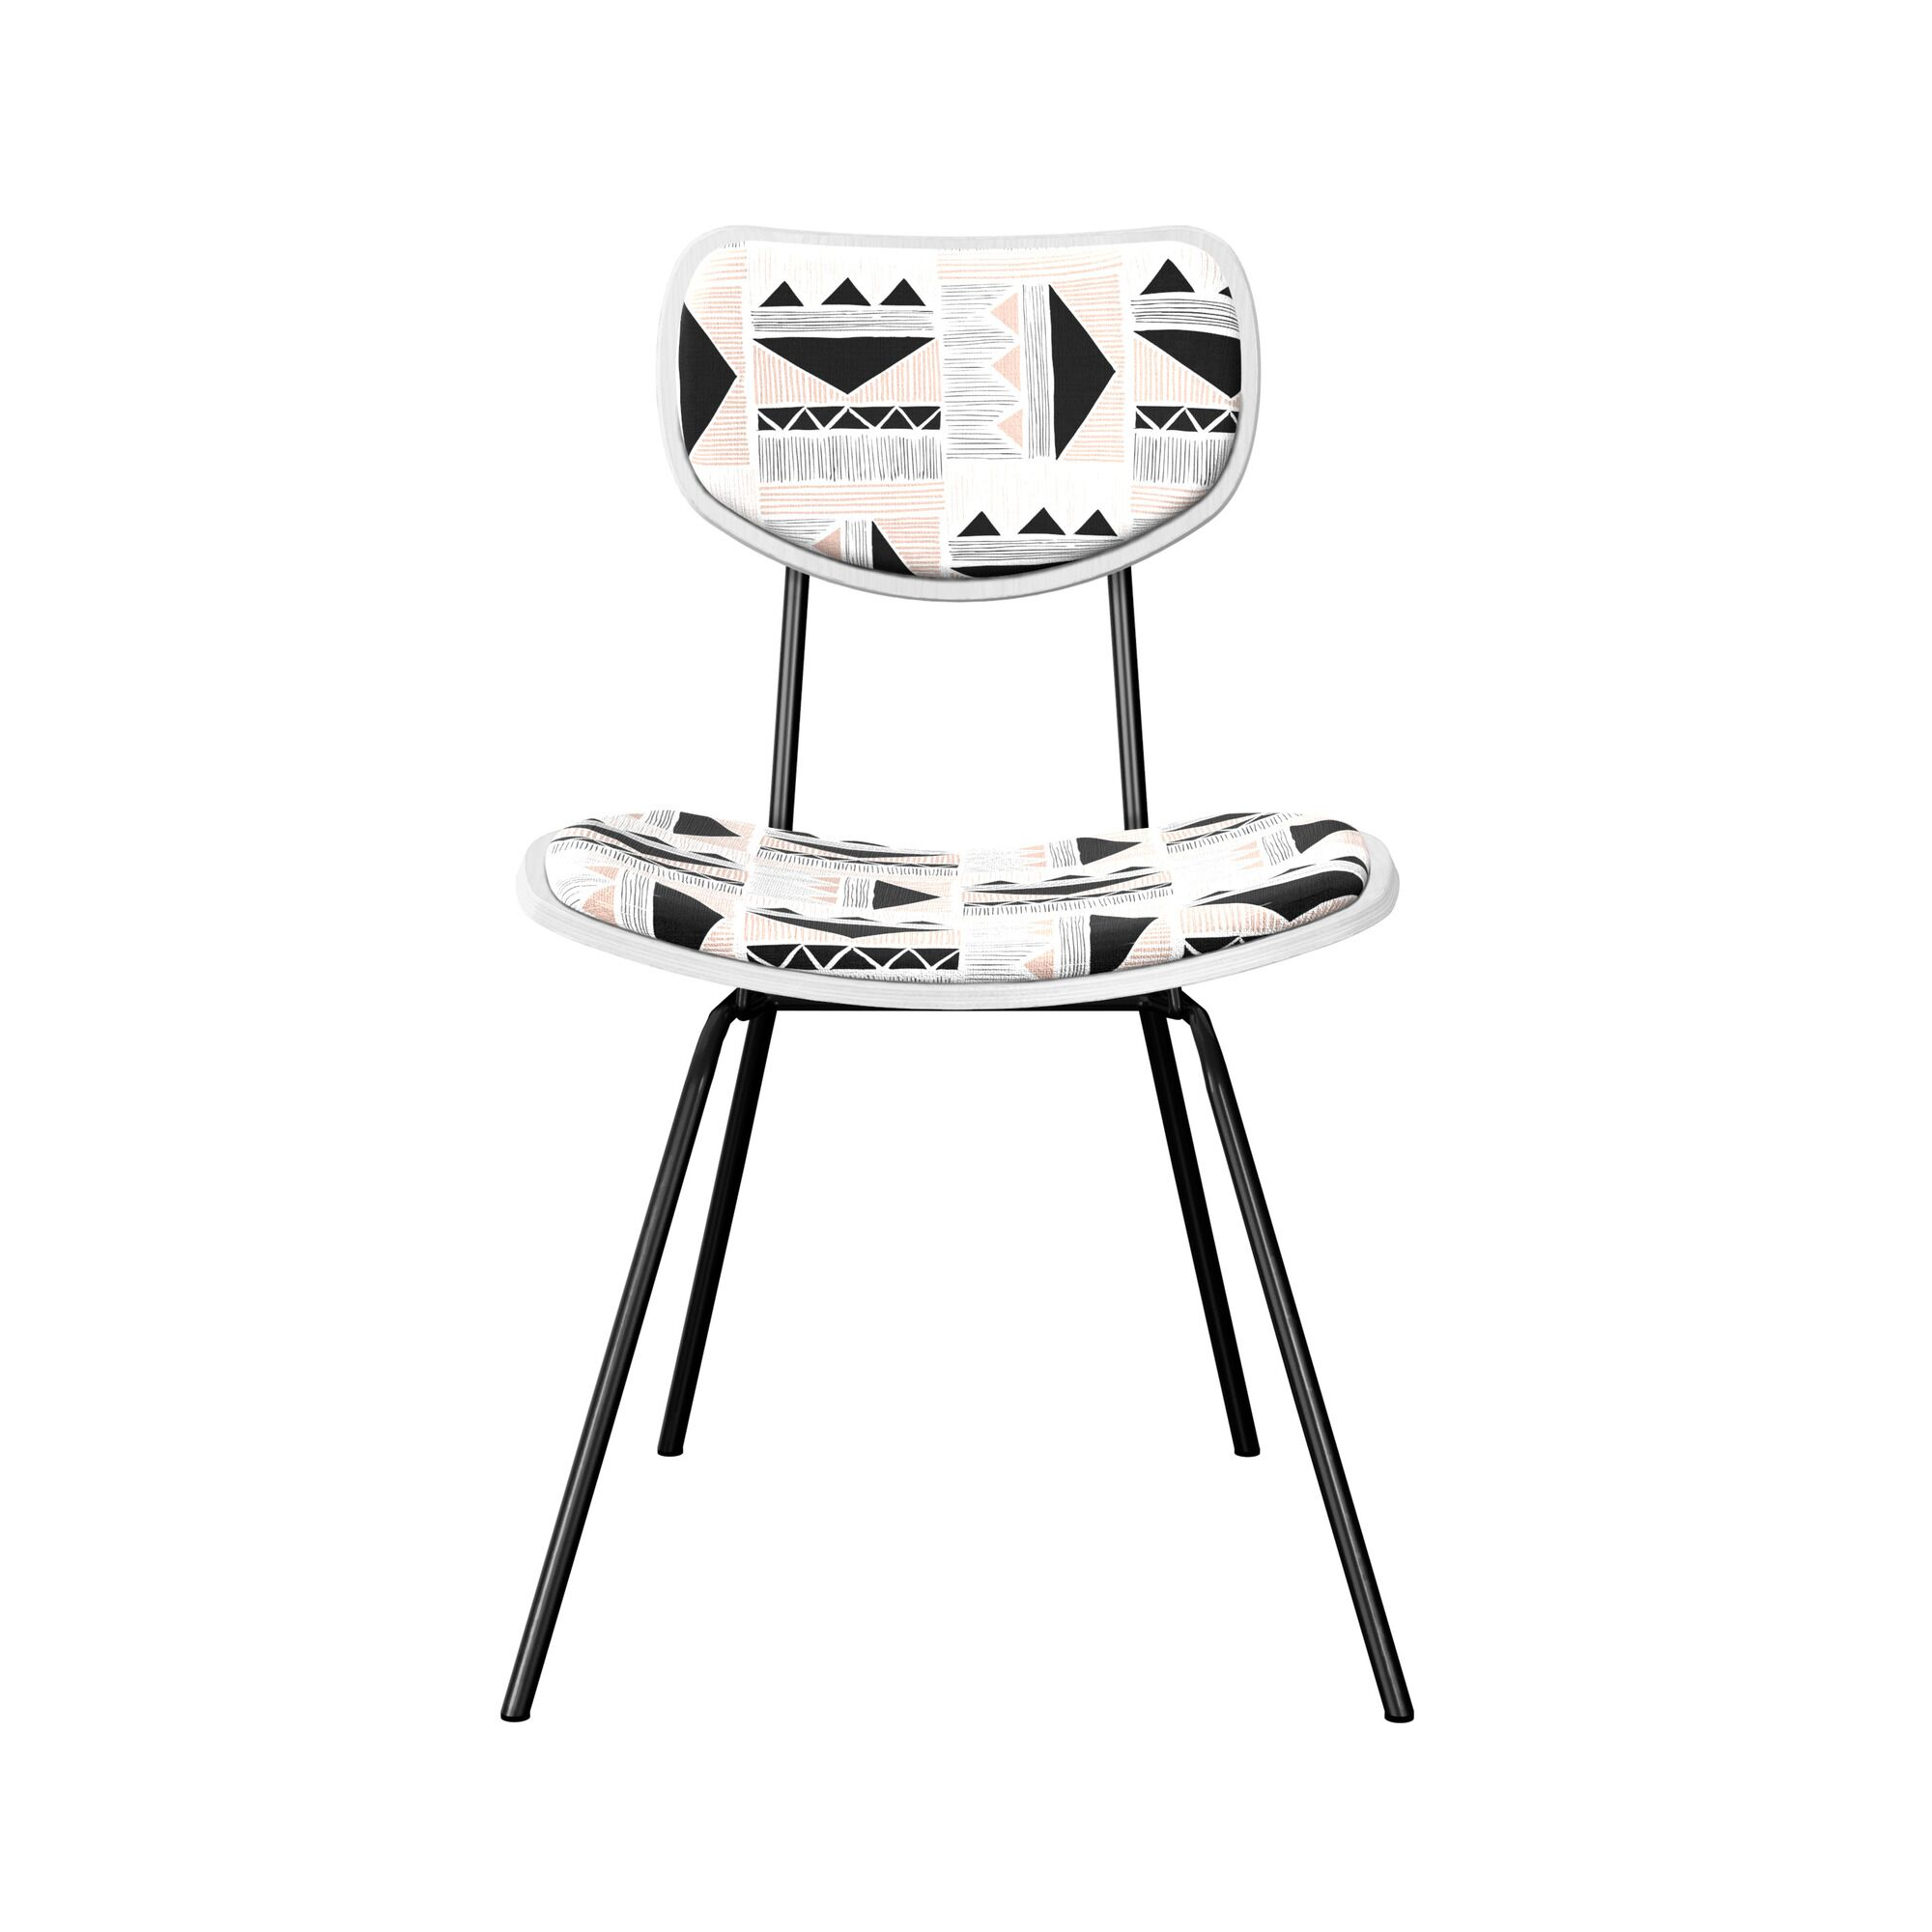 Dodington Upholstered Dining Chair Leg Color: Black, Frame Color: White